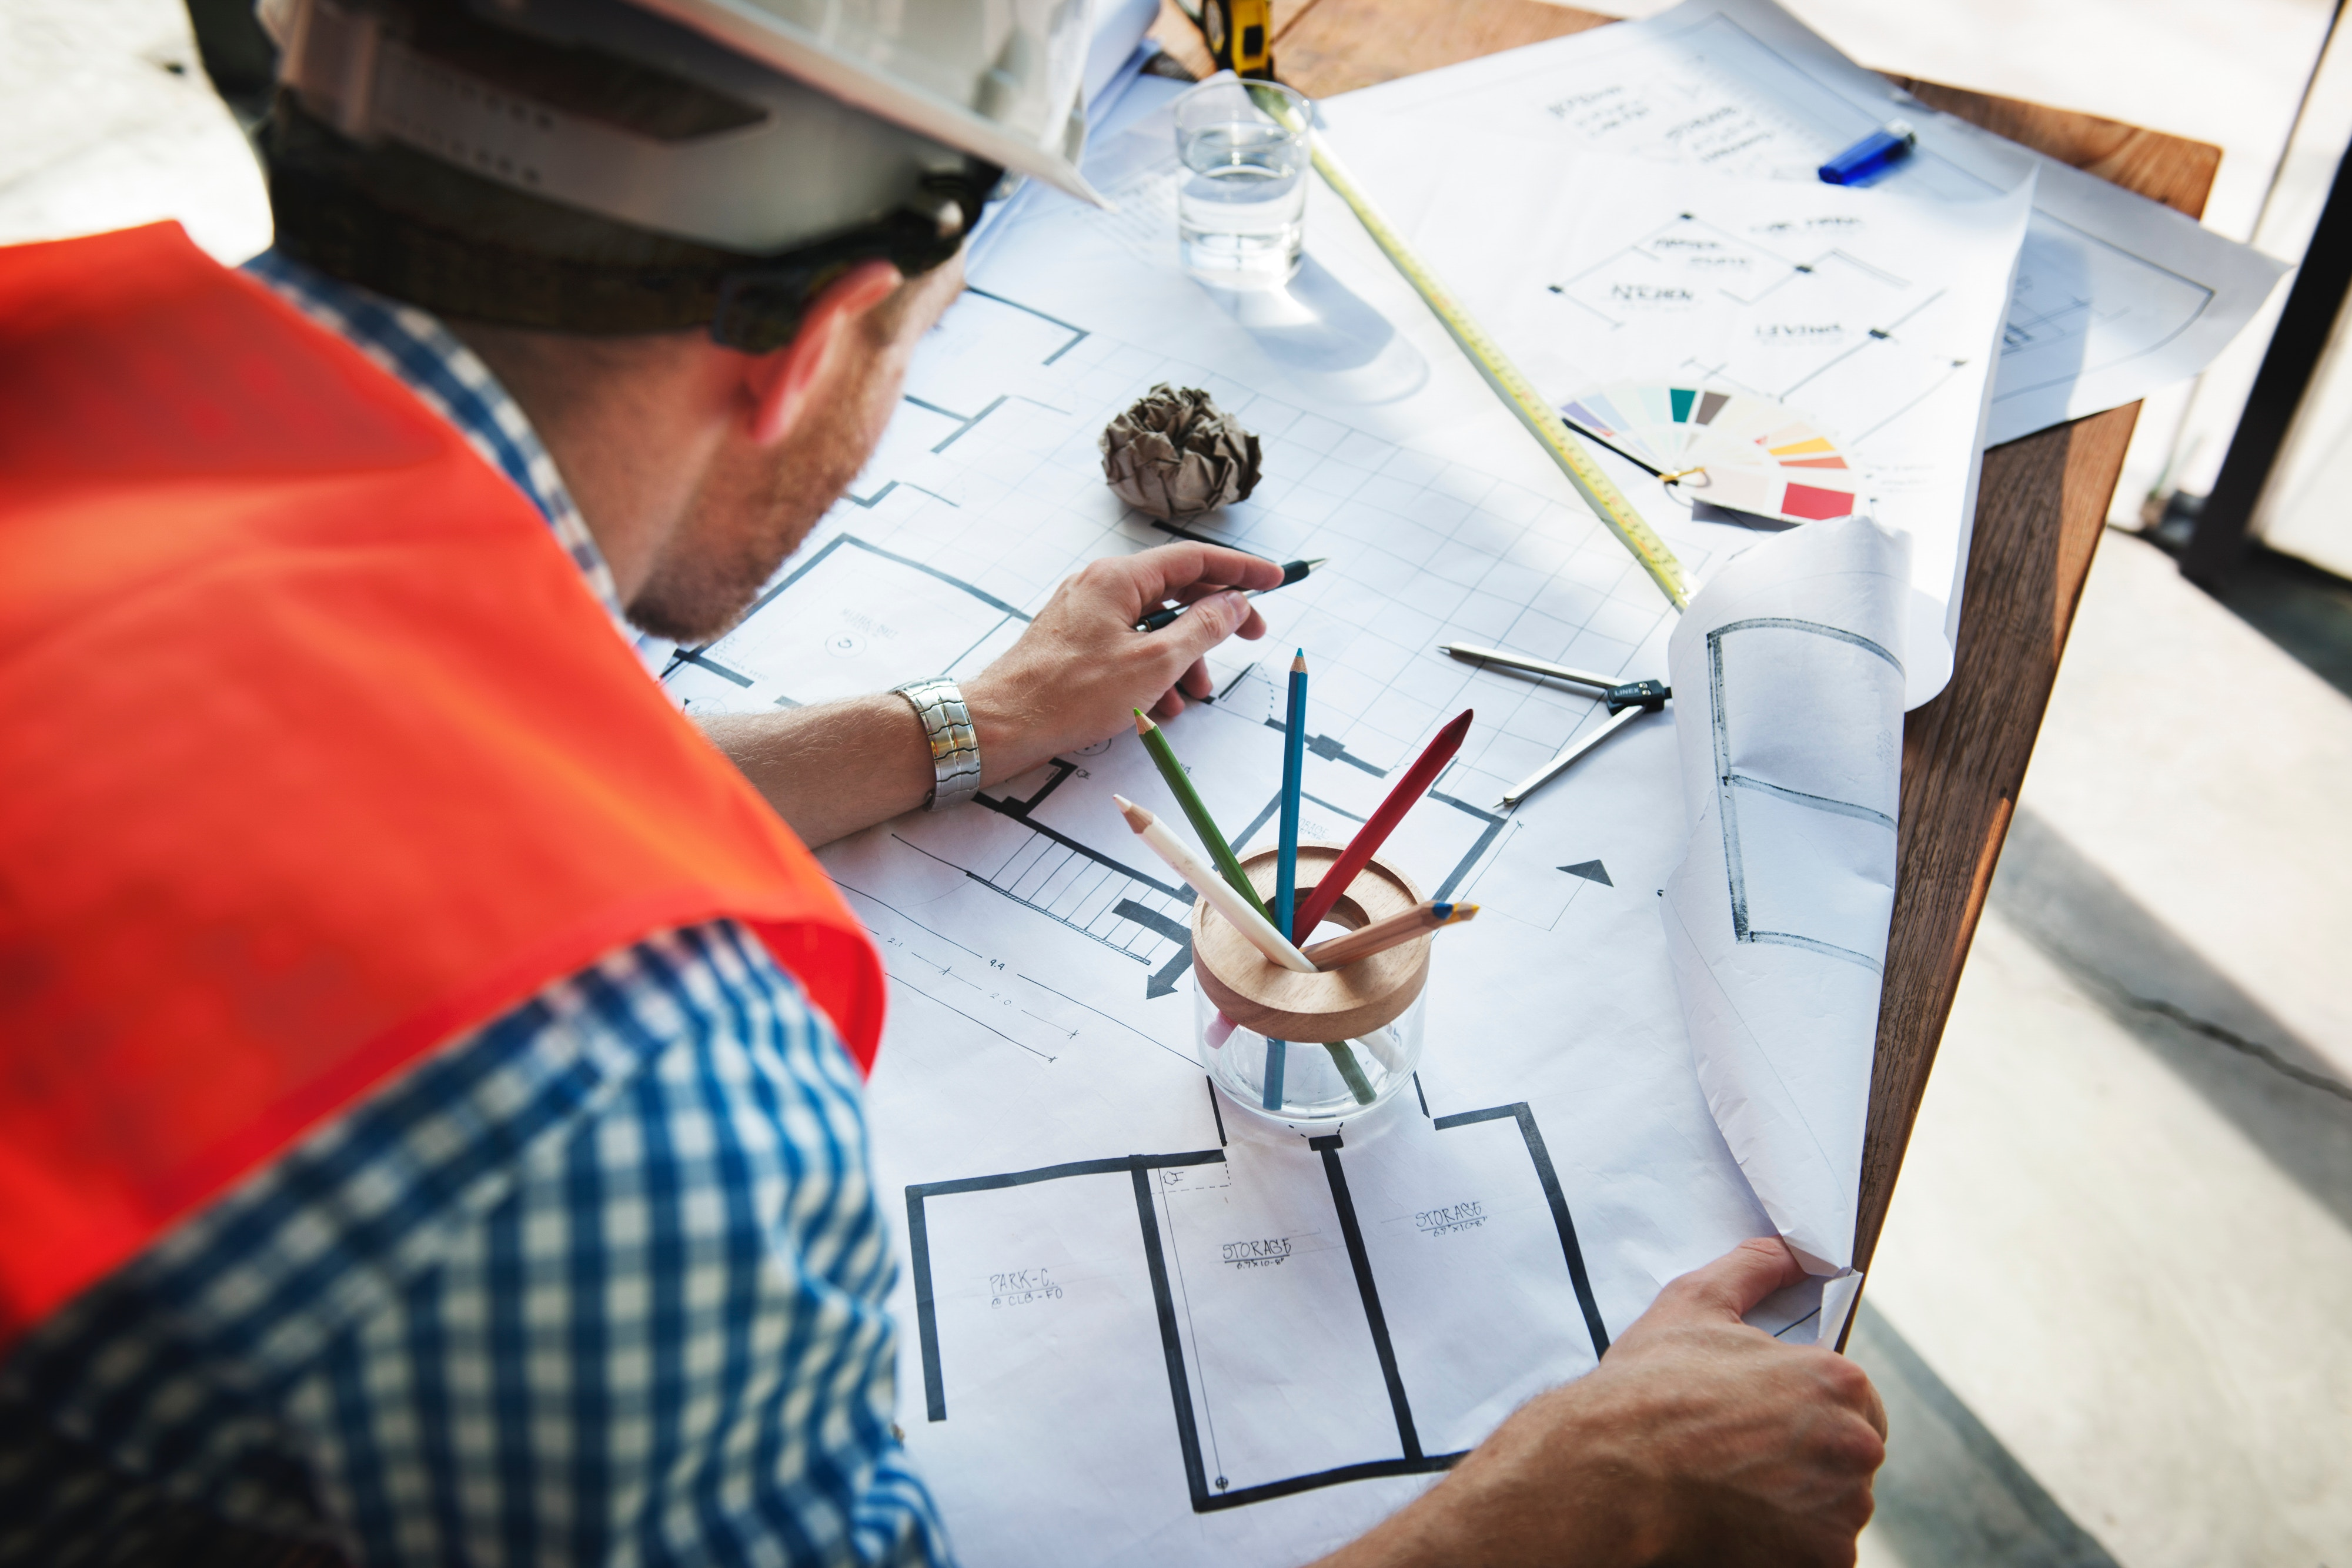 homme-casque-chantier-dessin-industrie